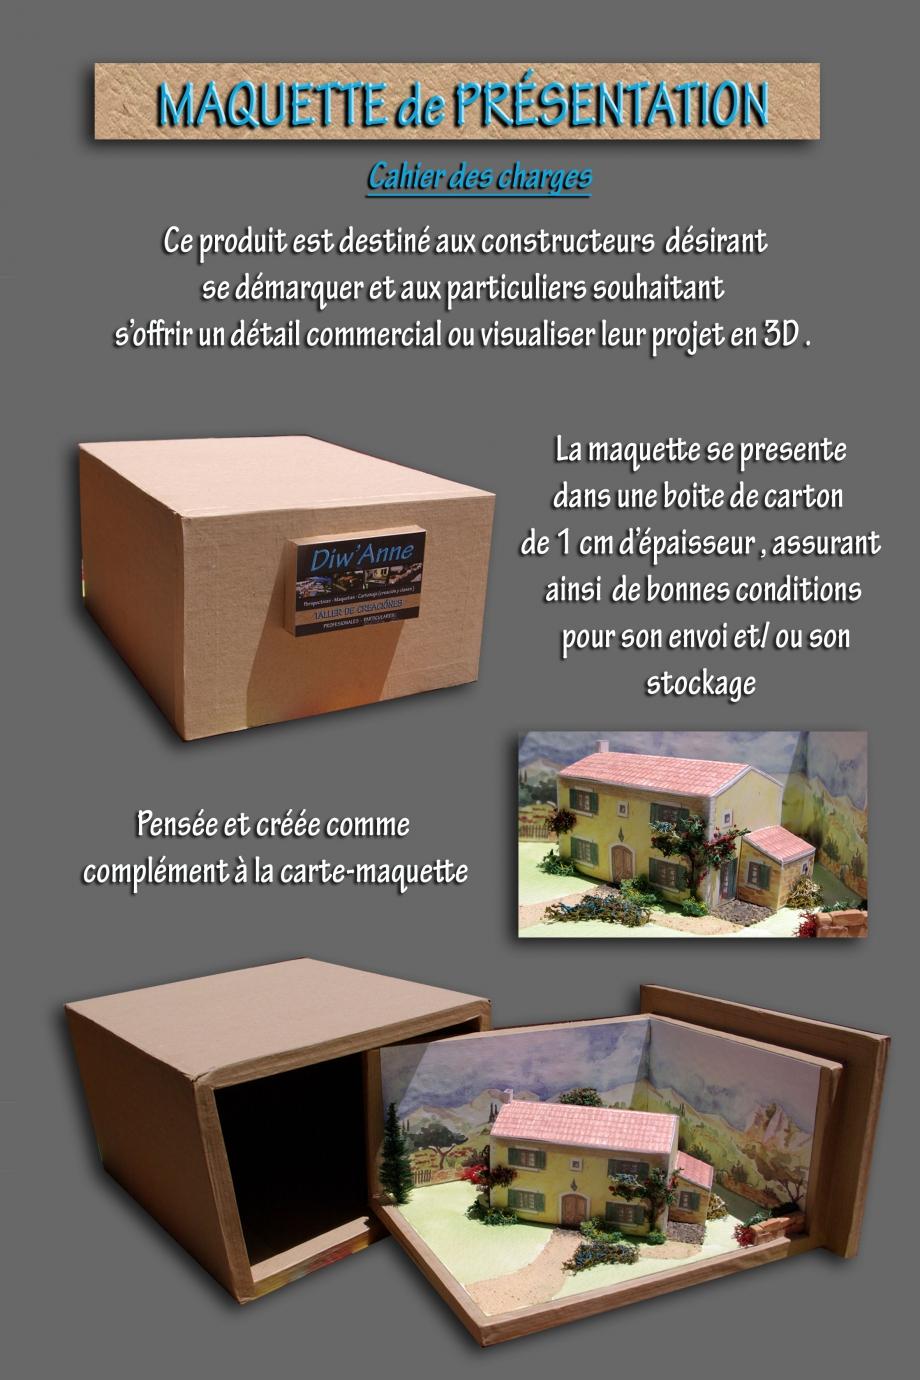 maquette volumen français.jpg